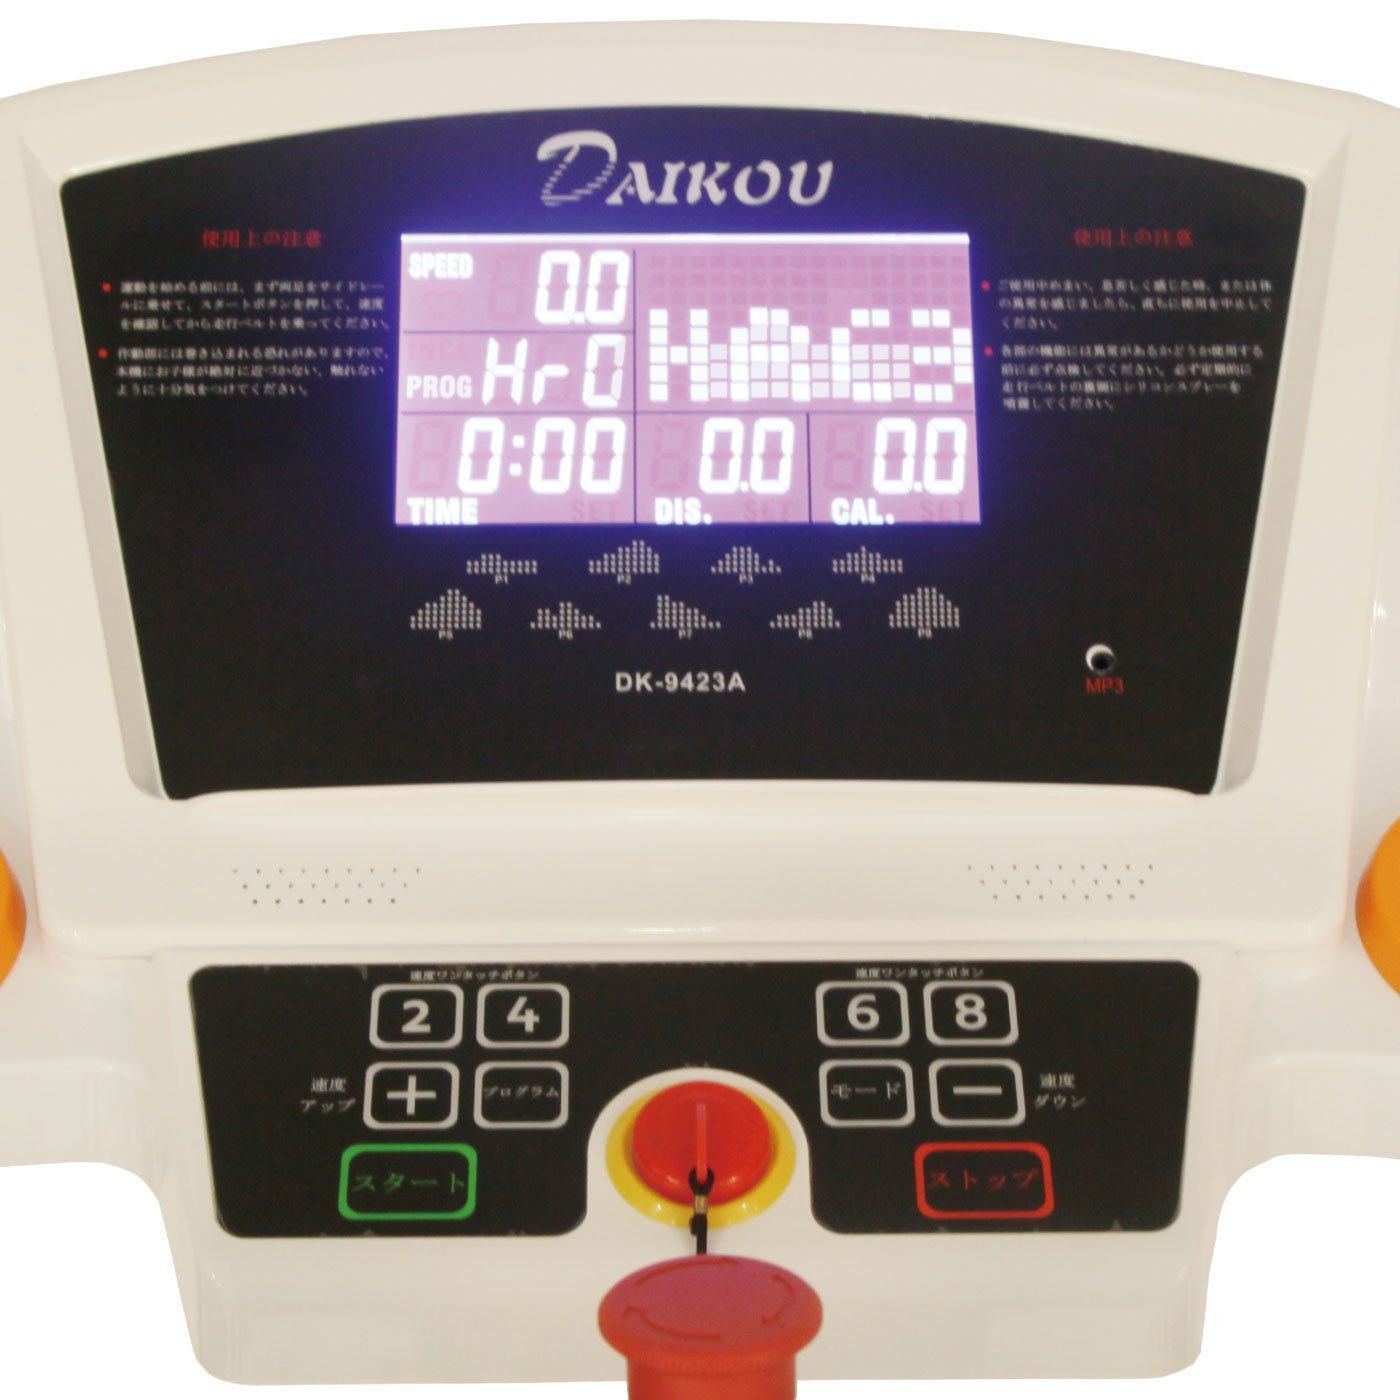 DK-9423A/家庭用ウォーキングマシン《DAIKOU(ダイコー)》